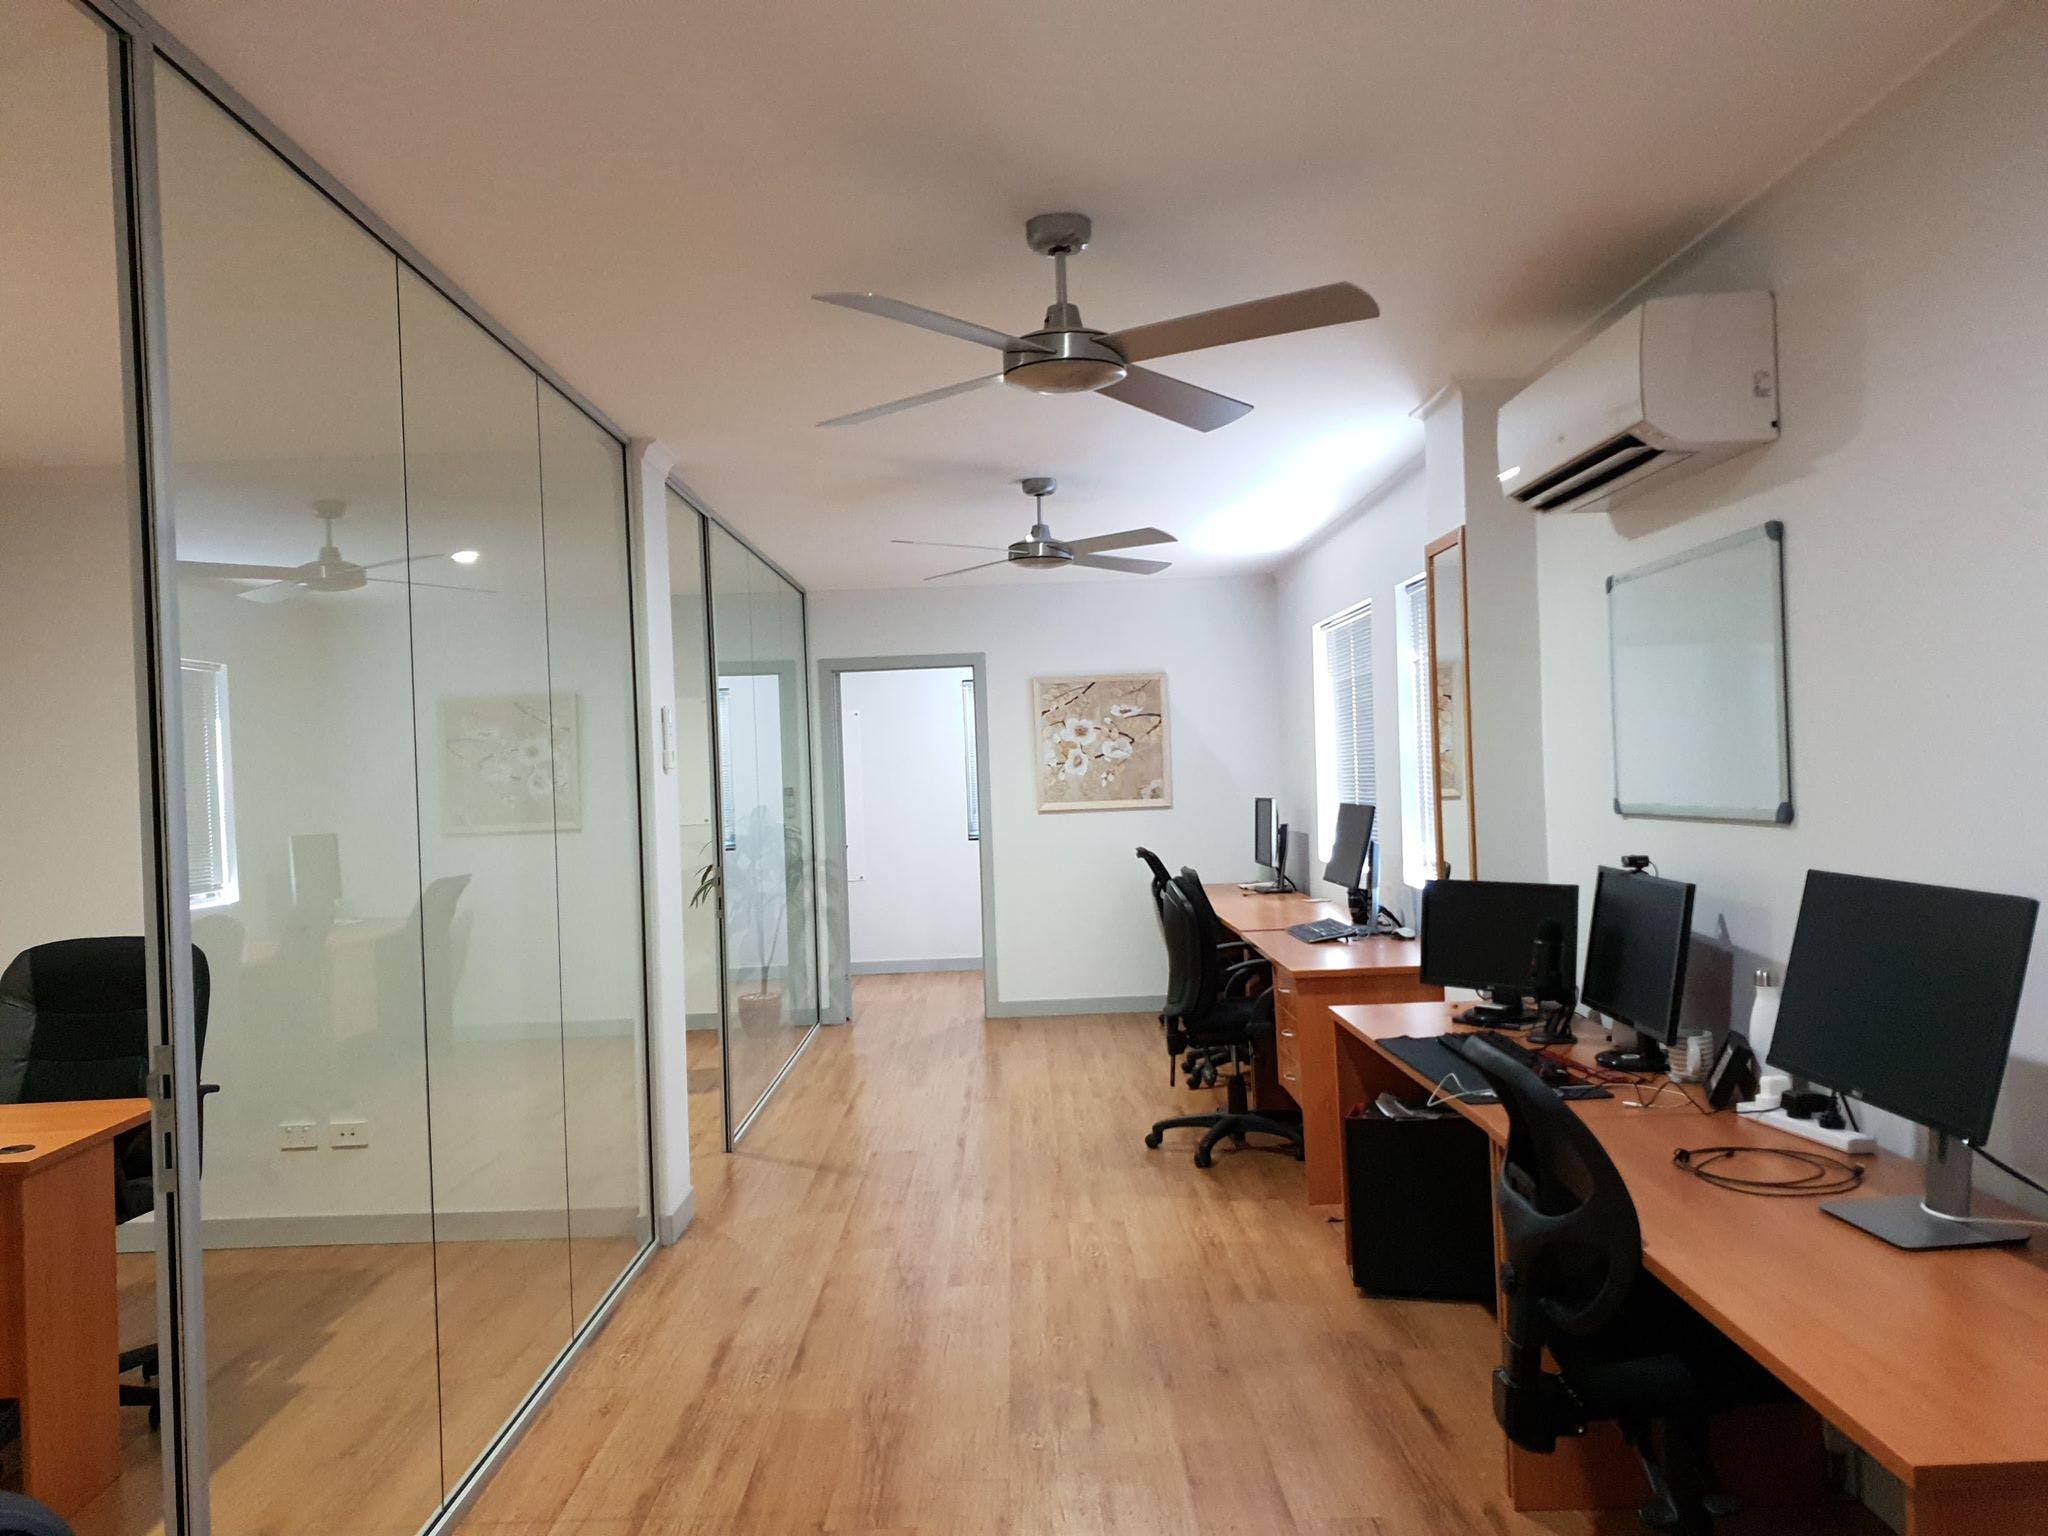 Meeting room at Buderim Hot Desks, image 2